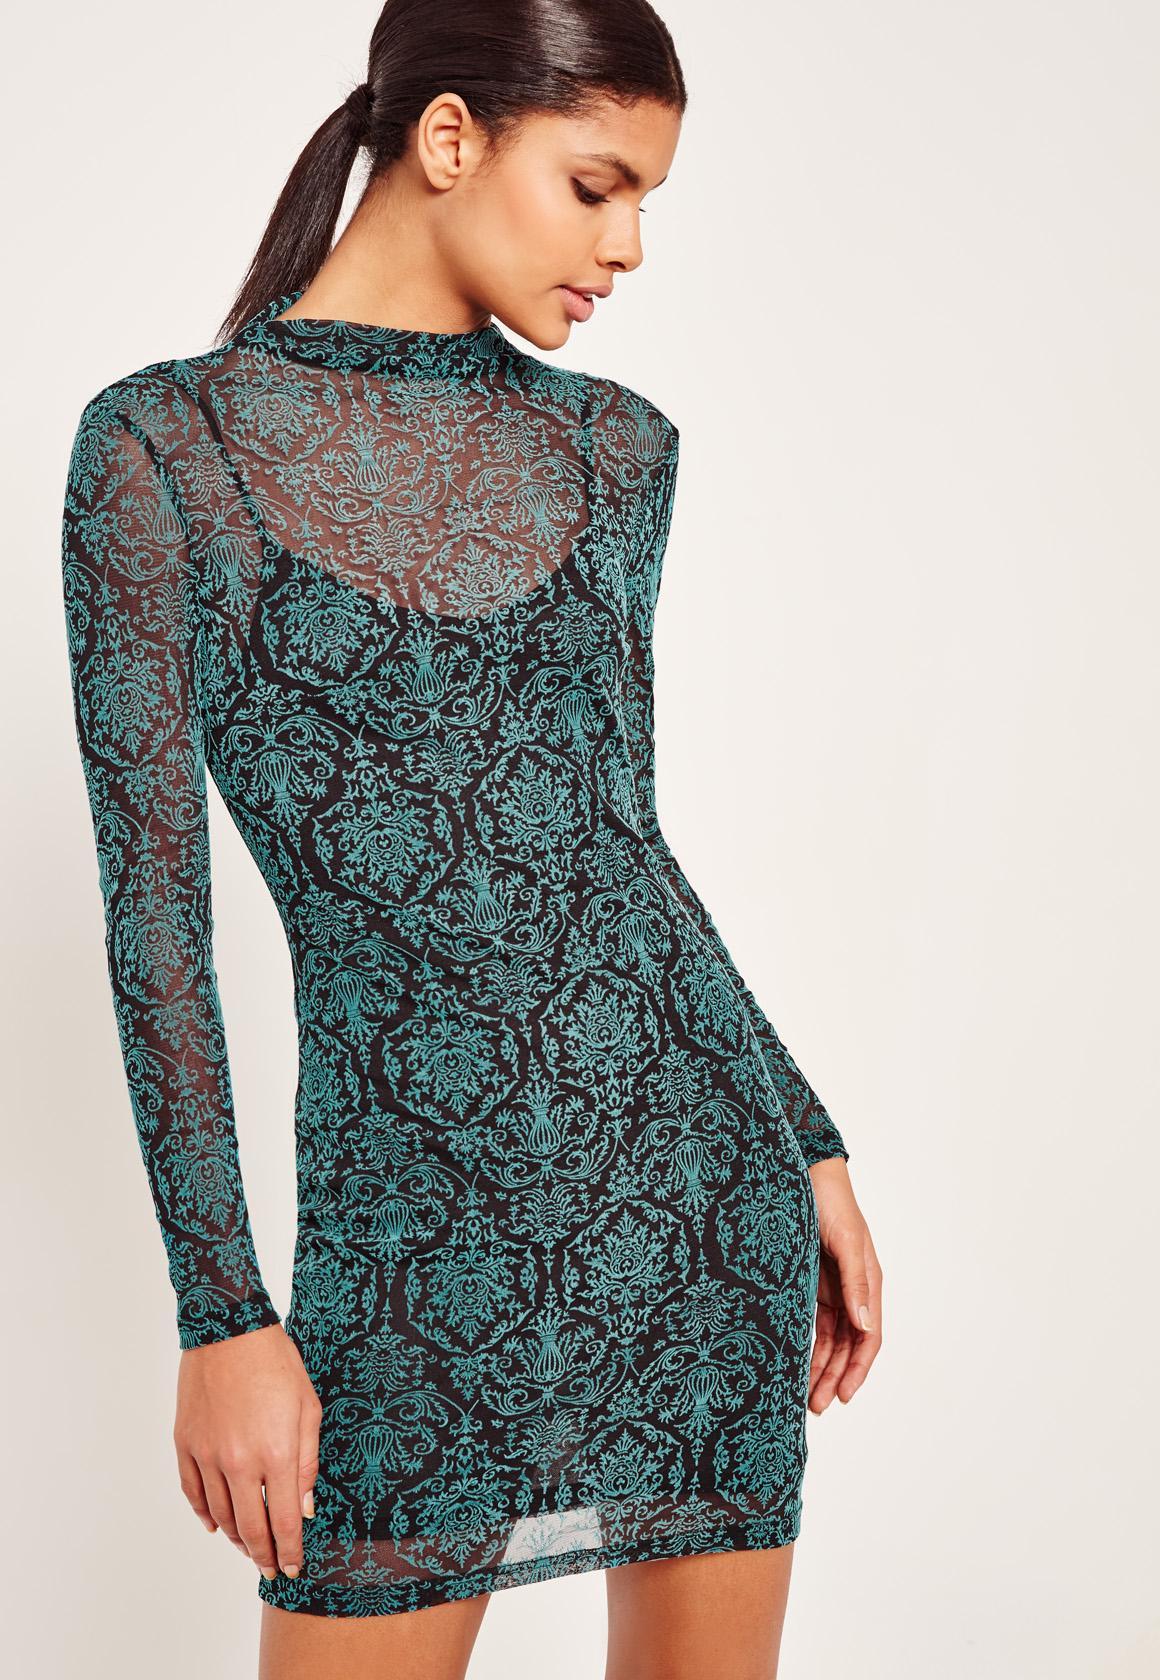 Jacquard Long Sleeve Bodycon Dress Black